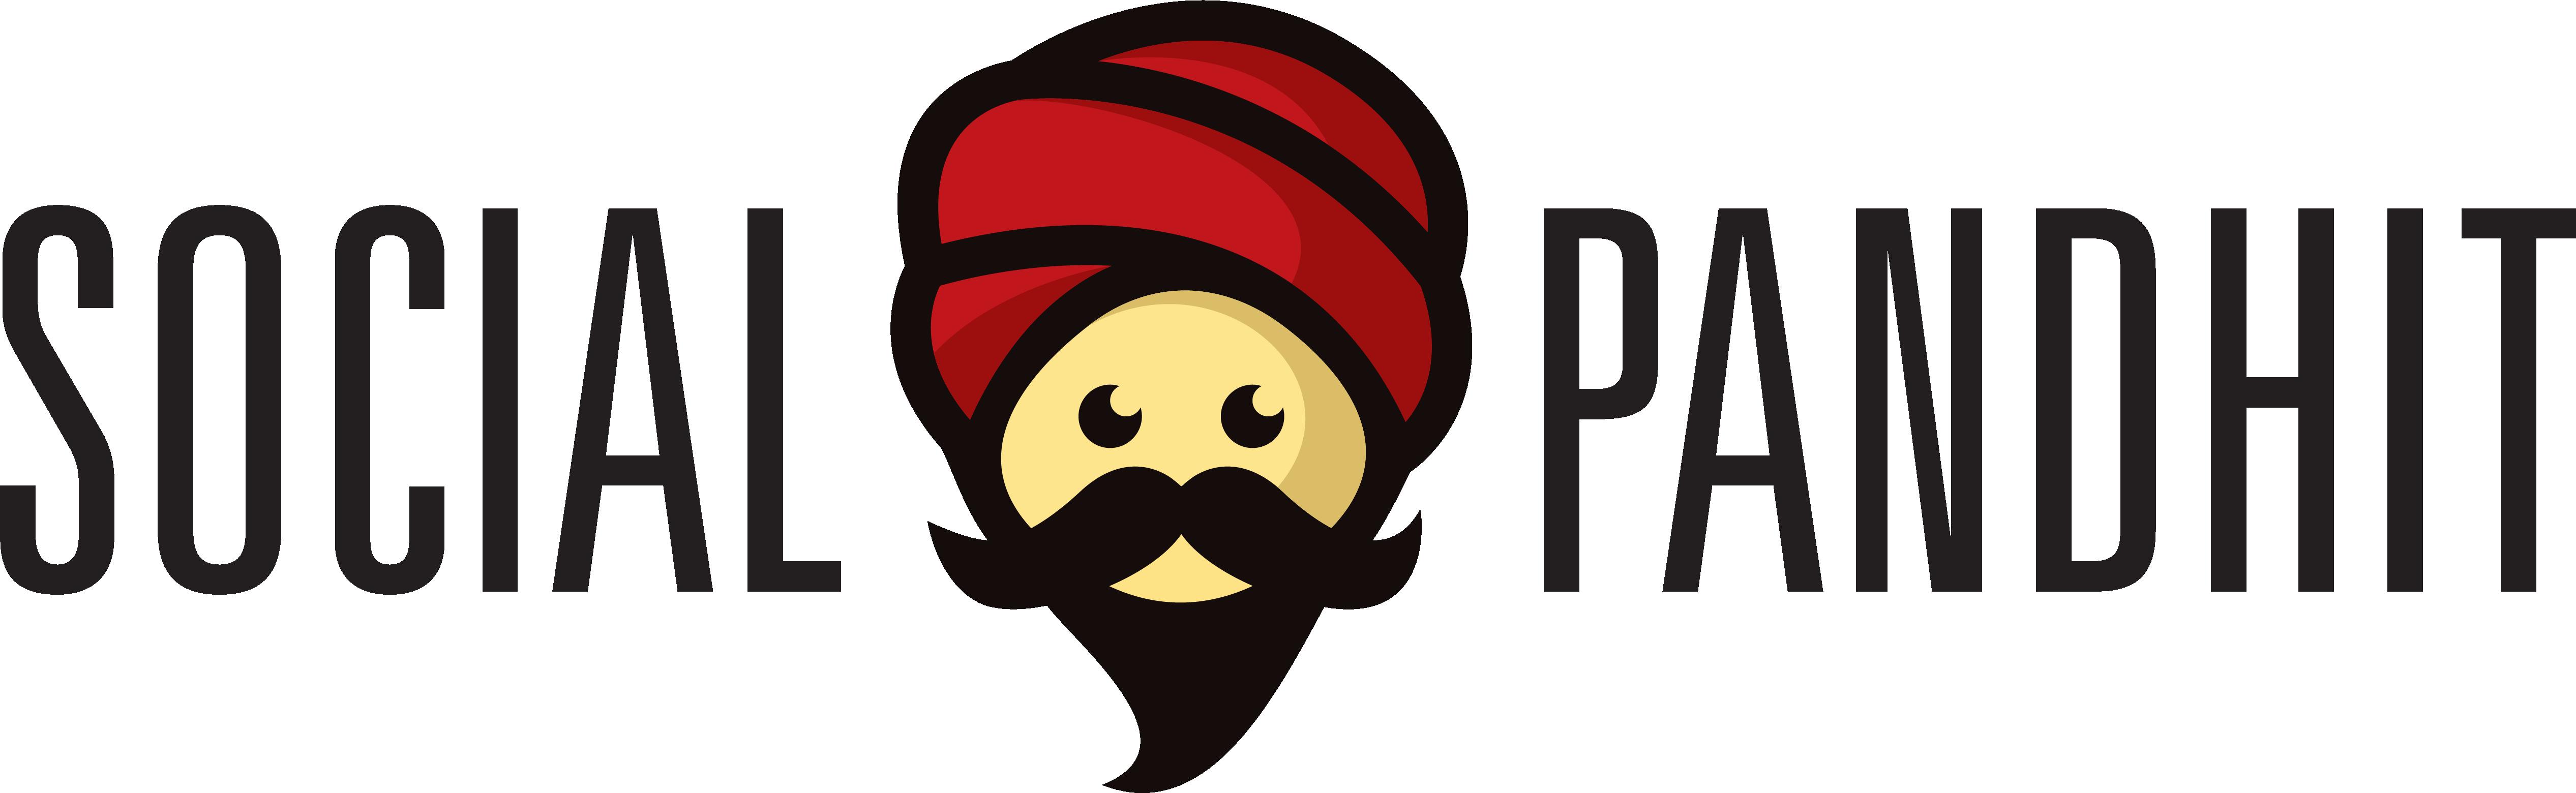 Social Pandhit